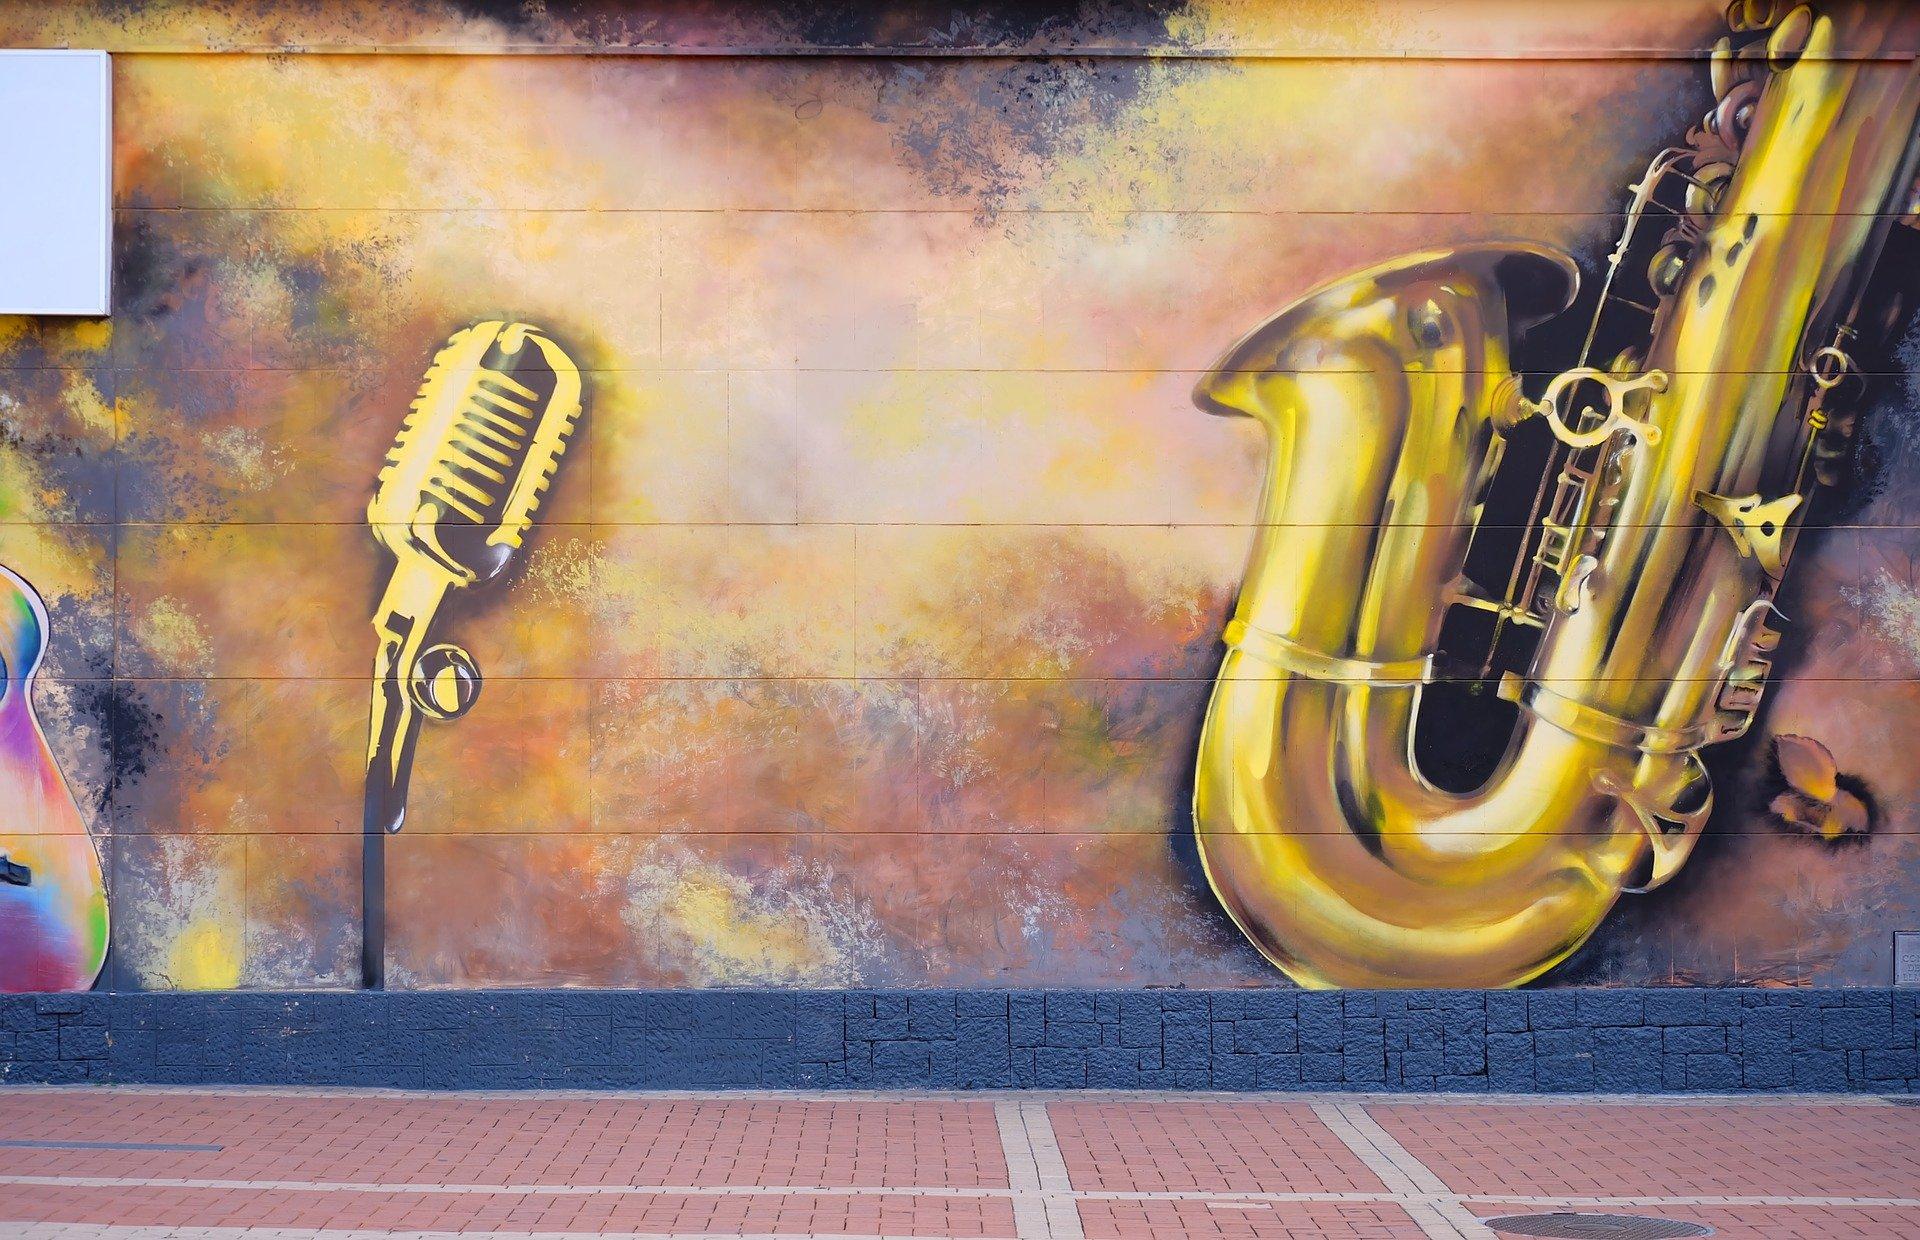 szaxofon graffiti